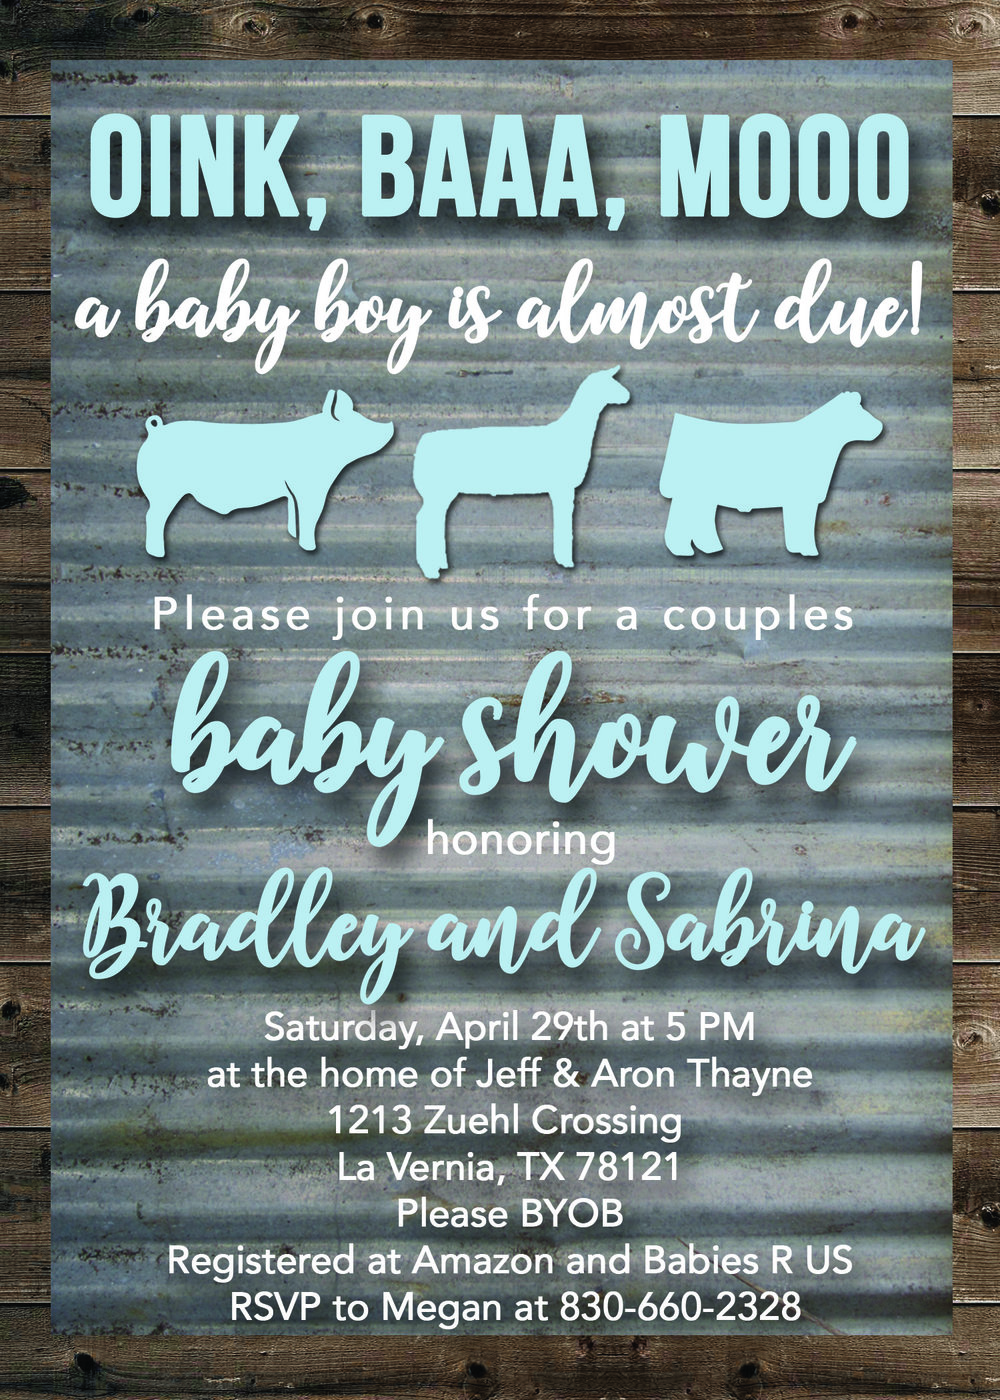 BabyShowerInvite copy.jpg